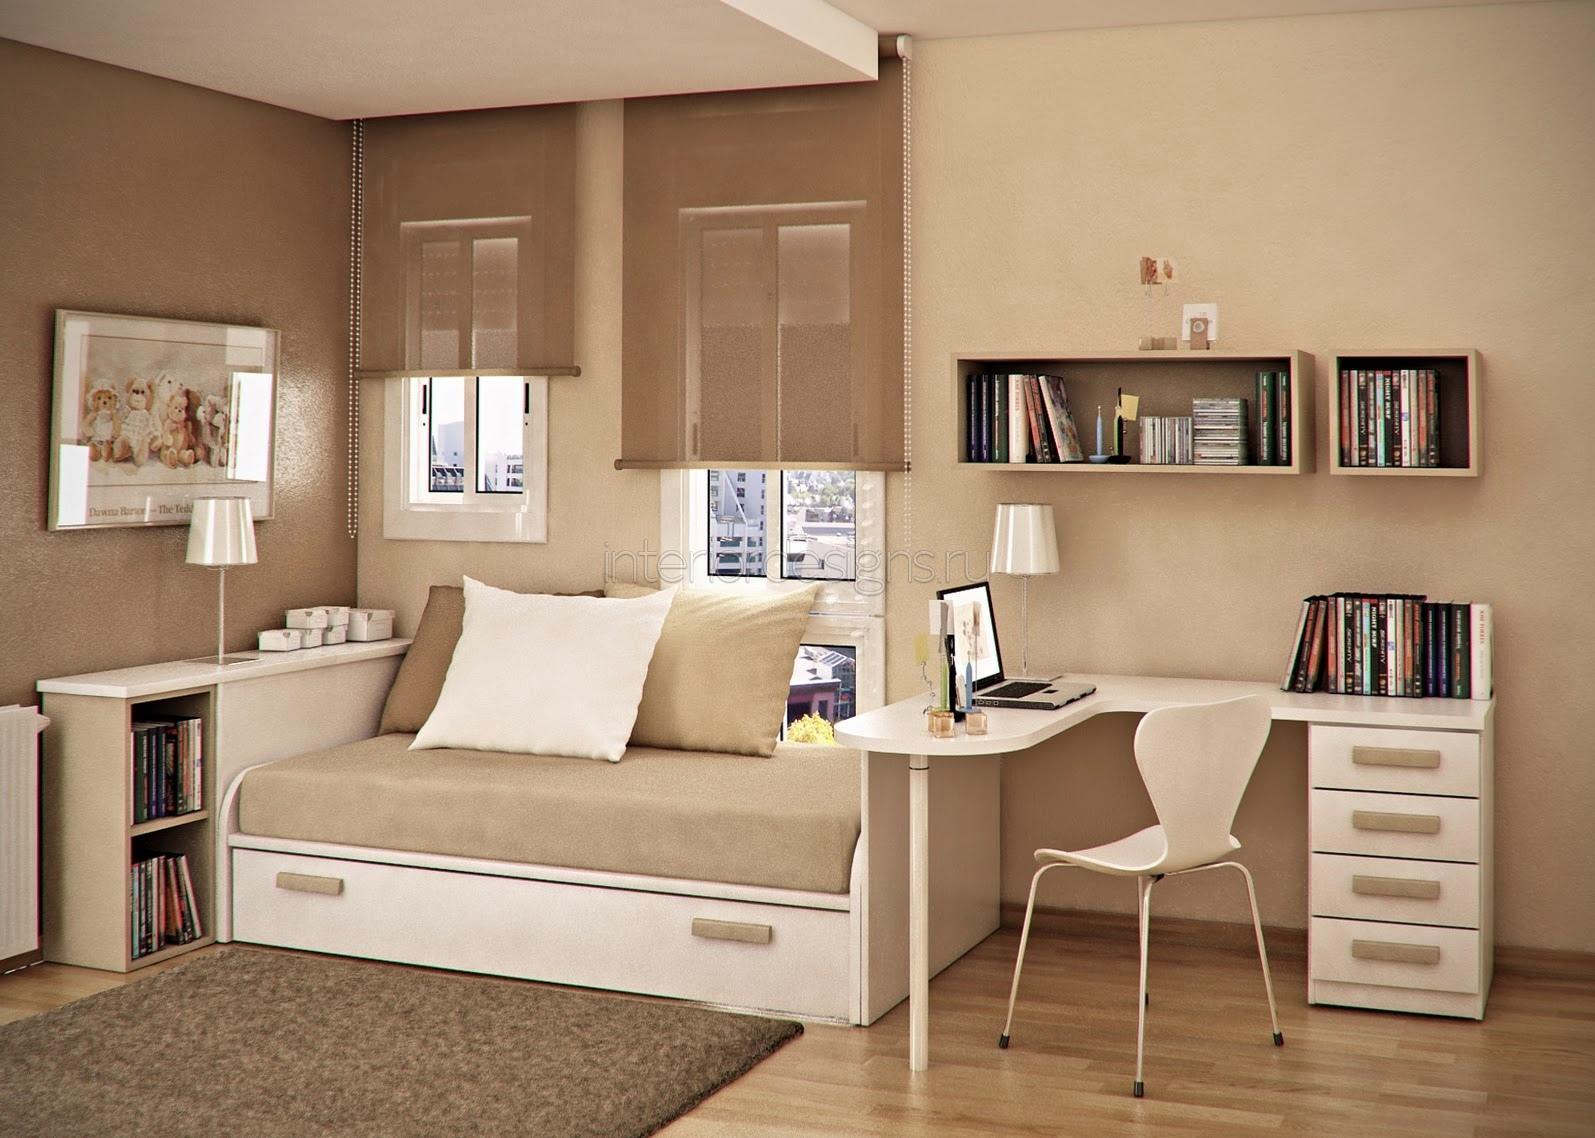 Small Bedroom Apartment Modern Small Studio Apartment Space Increasing Methods